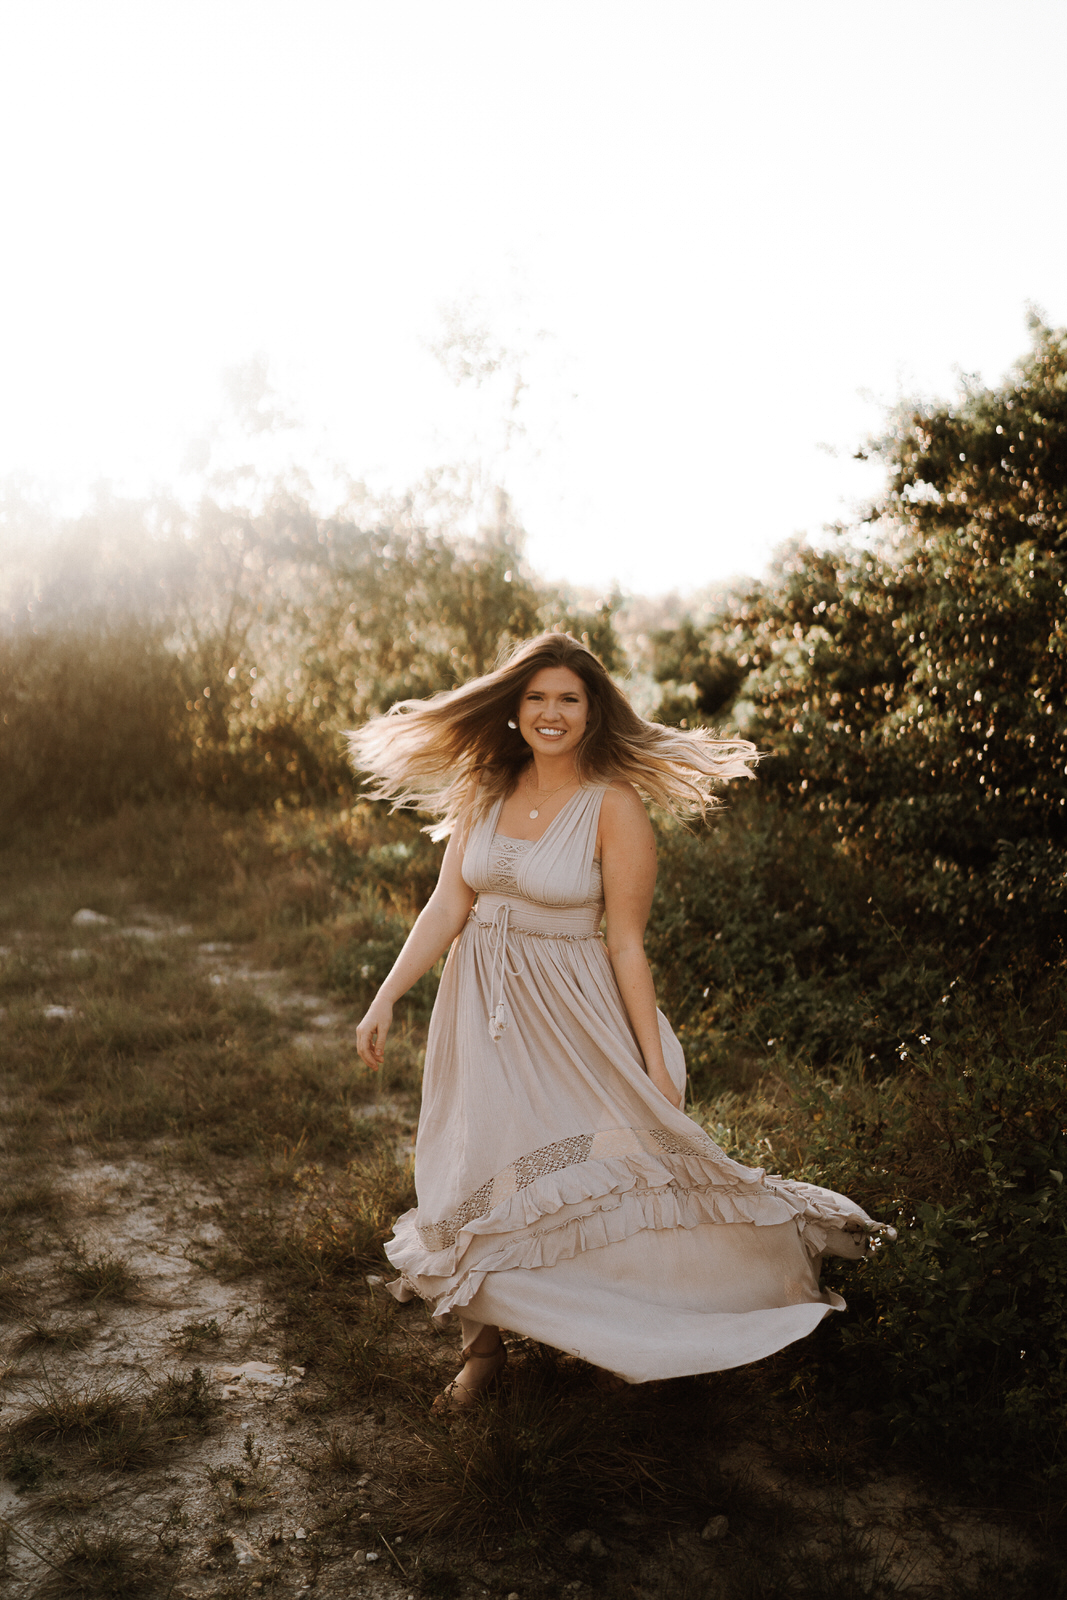 Fort Myers Senior Photos- Michelle Gonzalez Photography- Kristen Harder-26.JPG